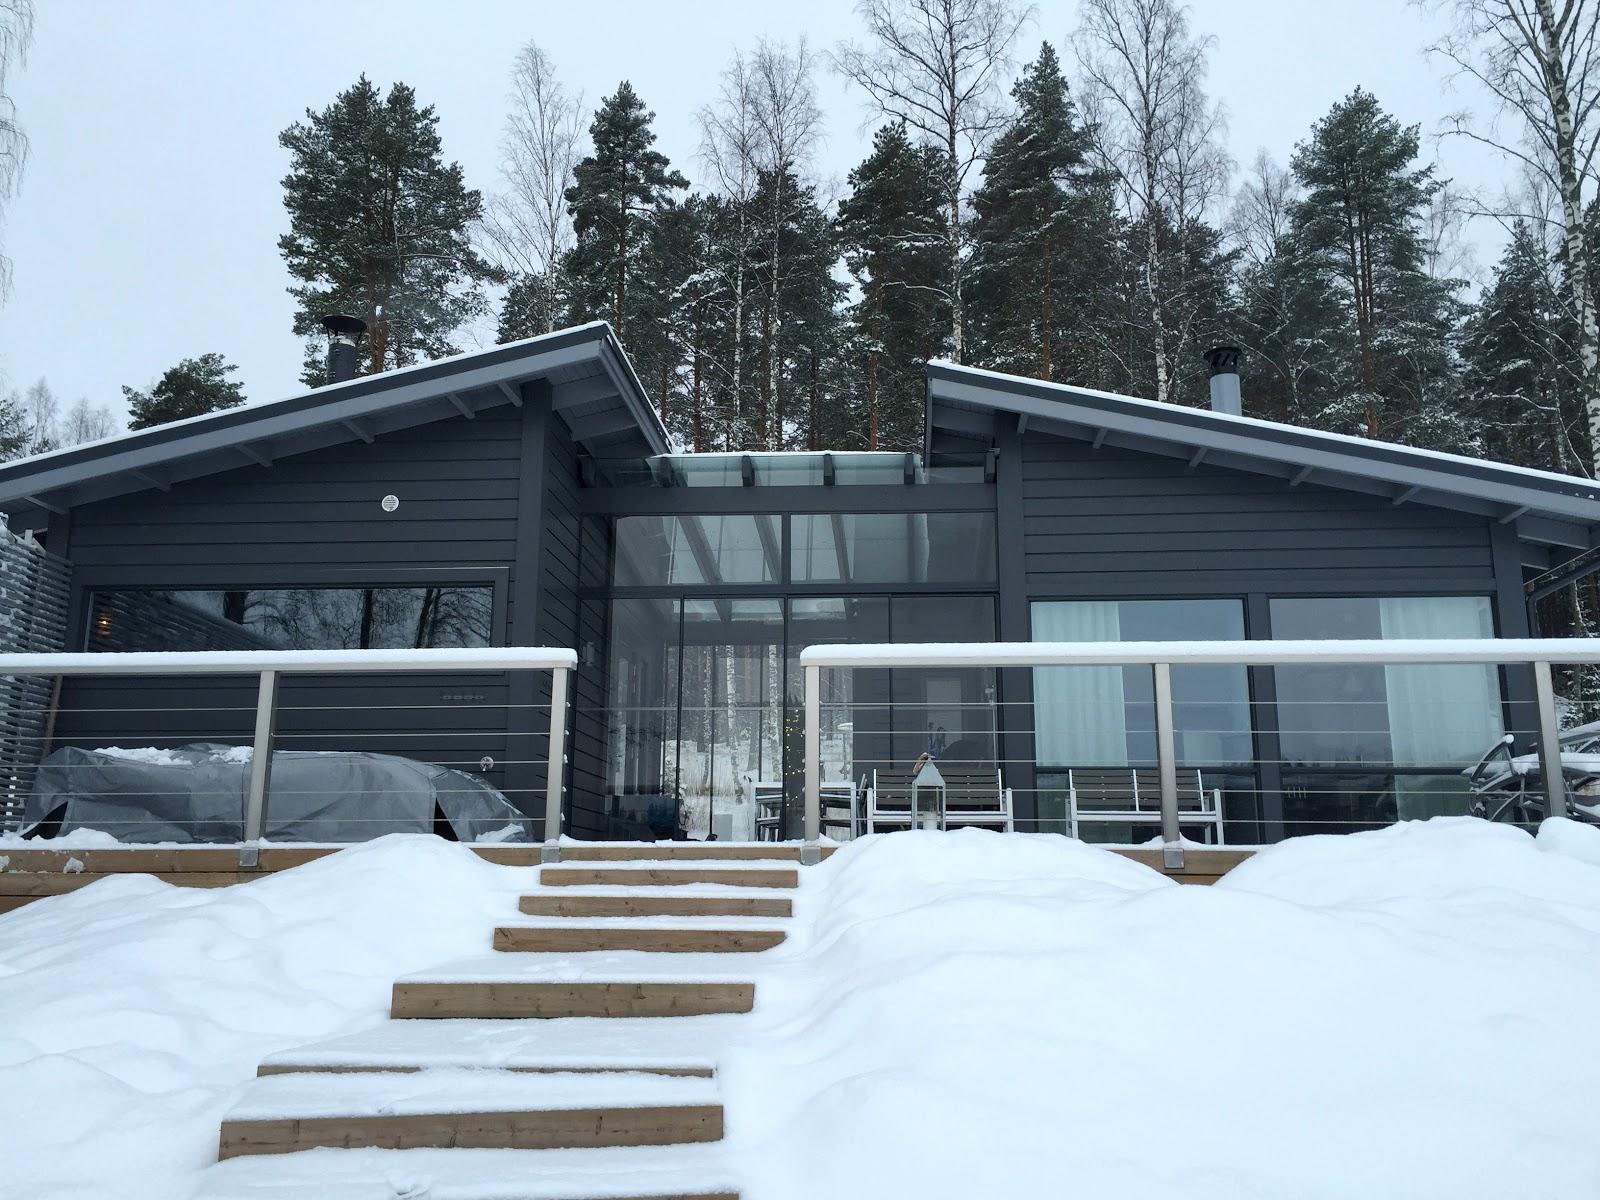 Snowy Cabin Finland, Padasjoki Finland